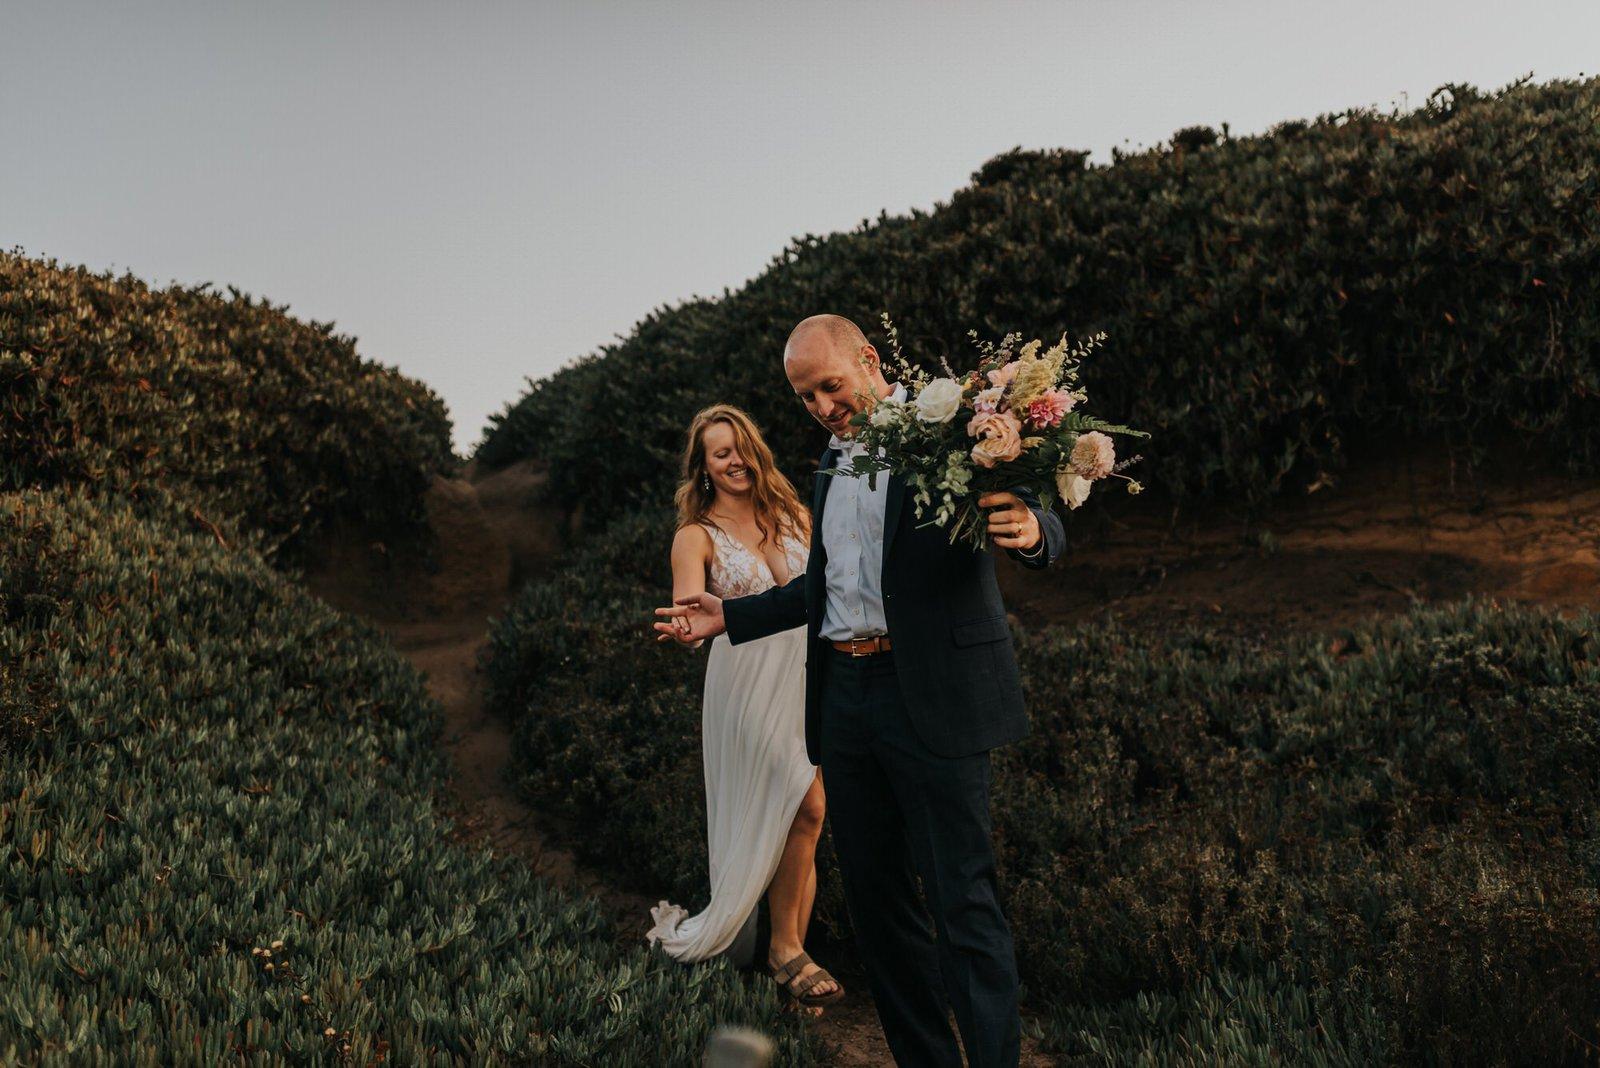 Bride and groom by California's coast.